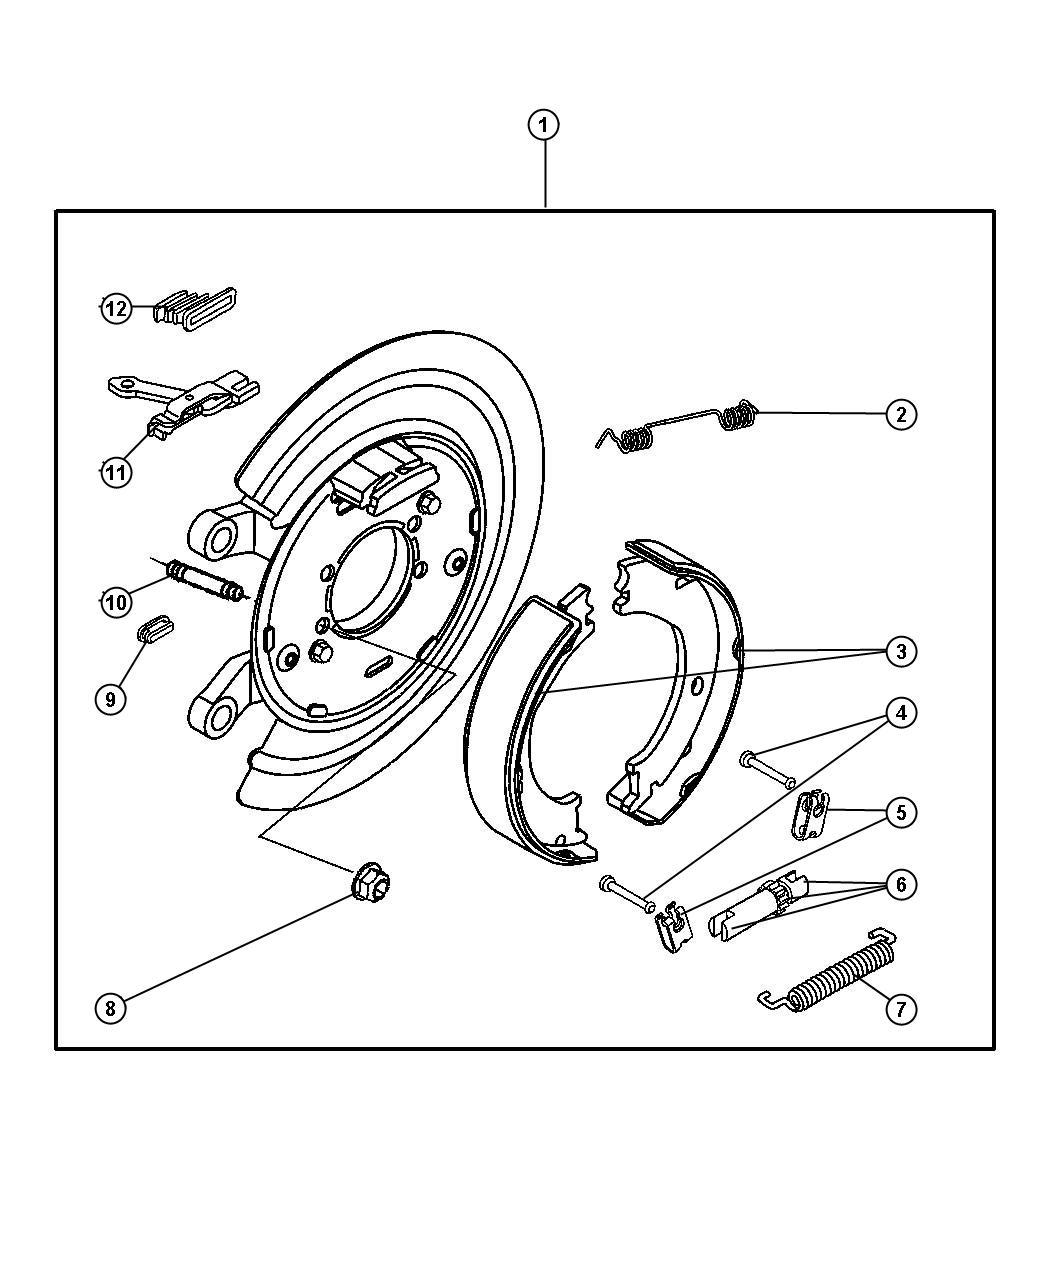 2013 Jeep Patriot Shoe kit. Parking brake. Contains 4